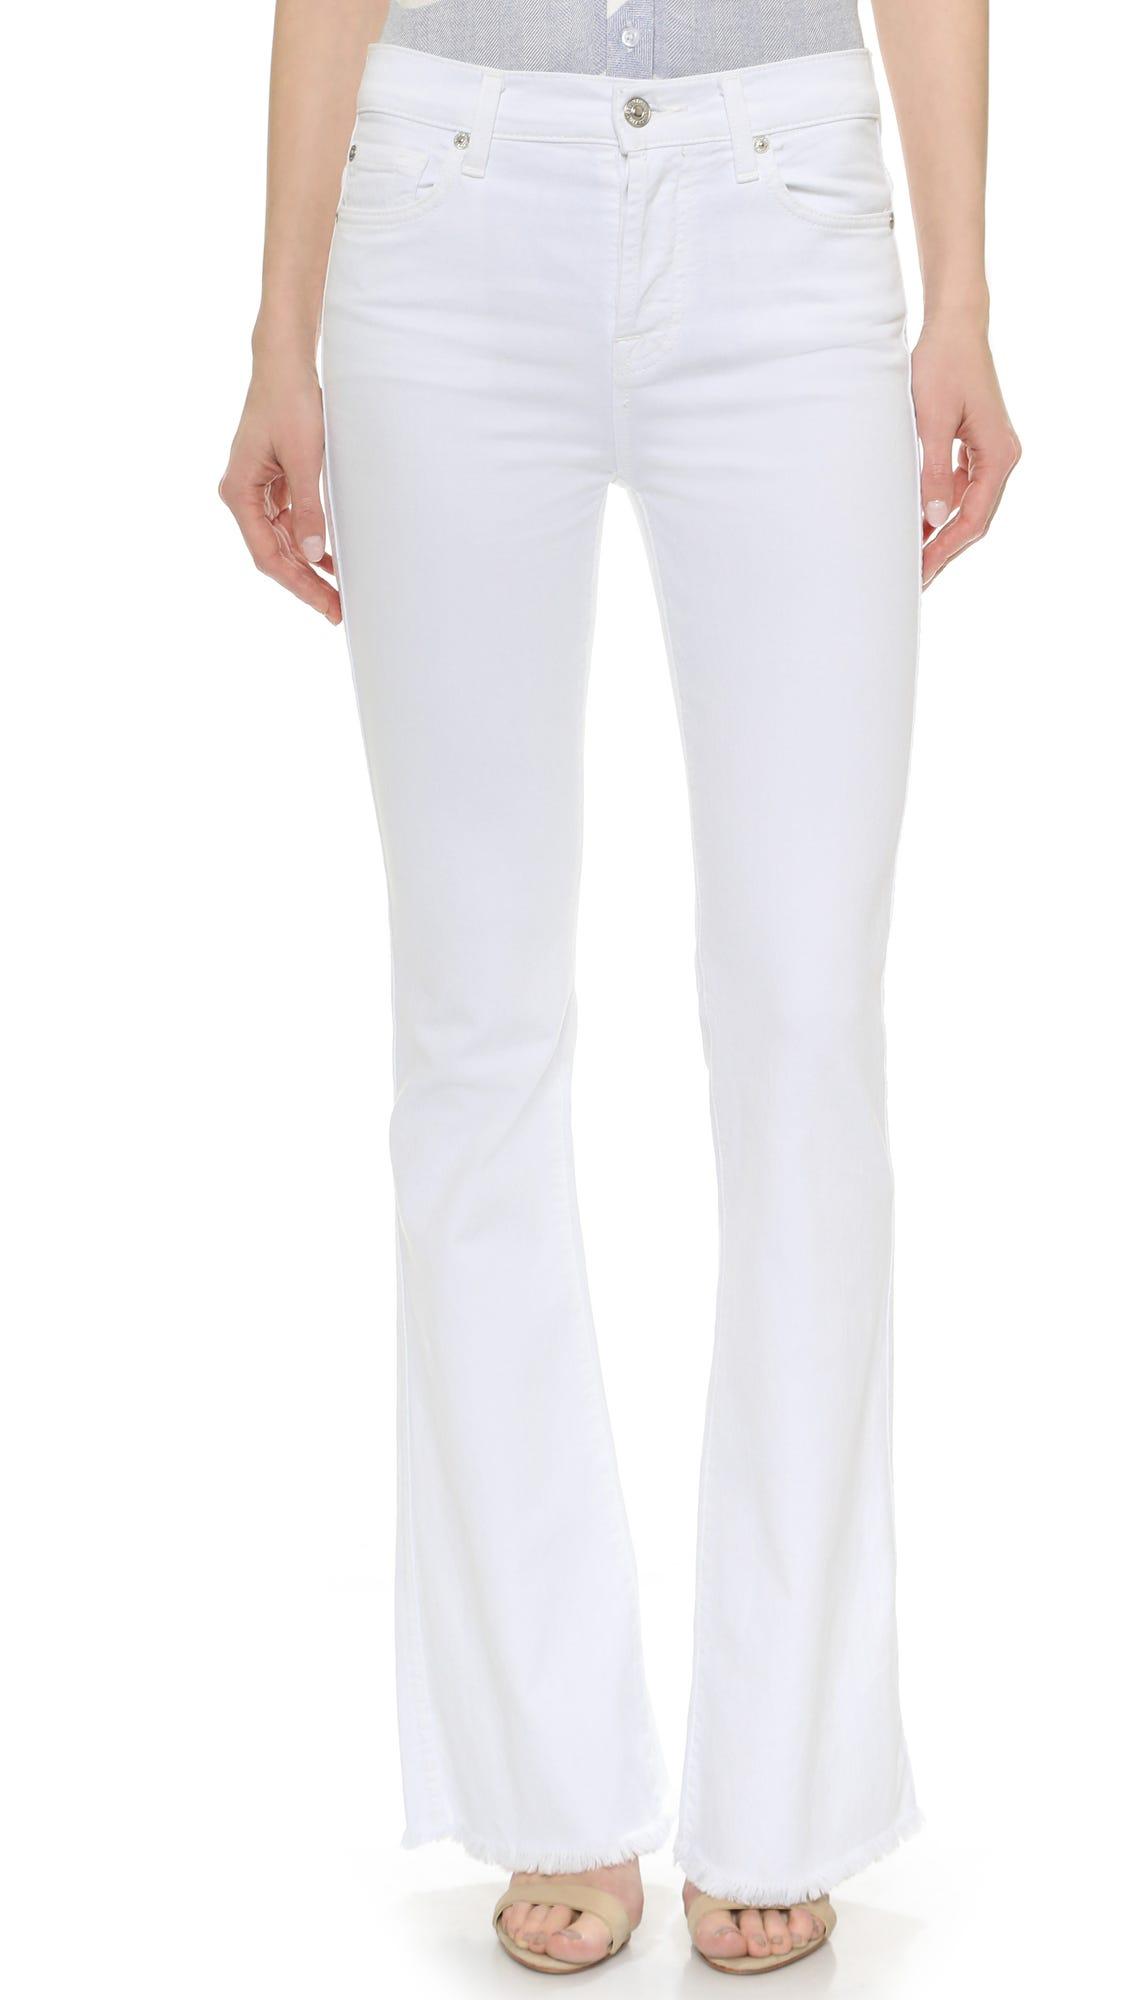 5e43fd05fdaced Fall Jeans For Women Non Skinny Denim